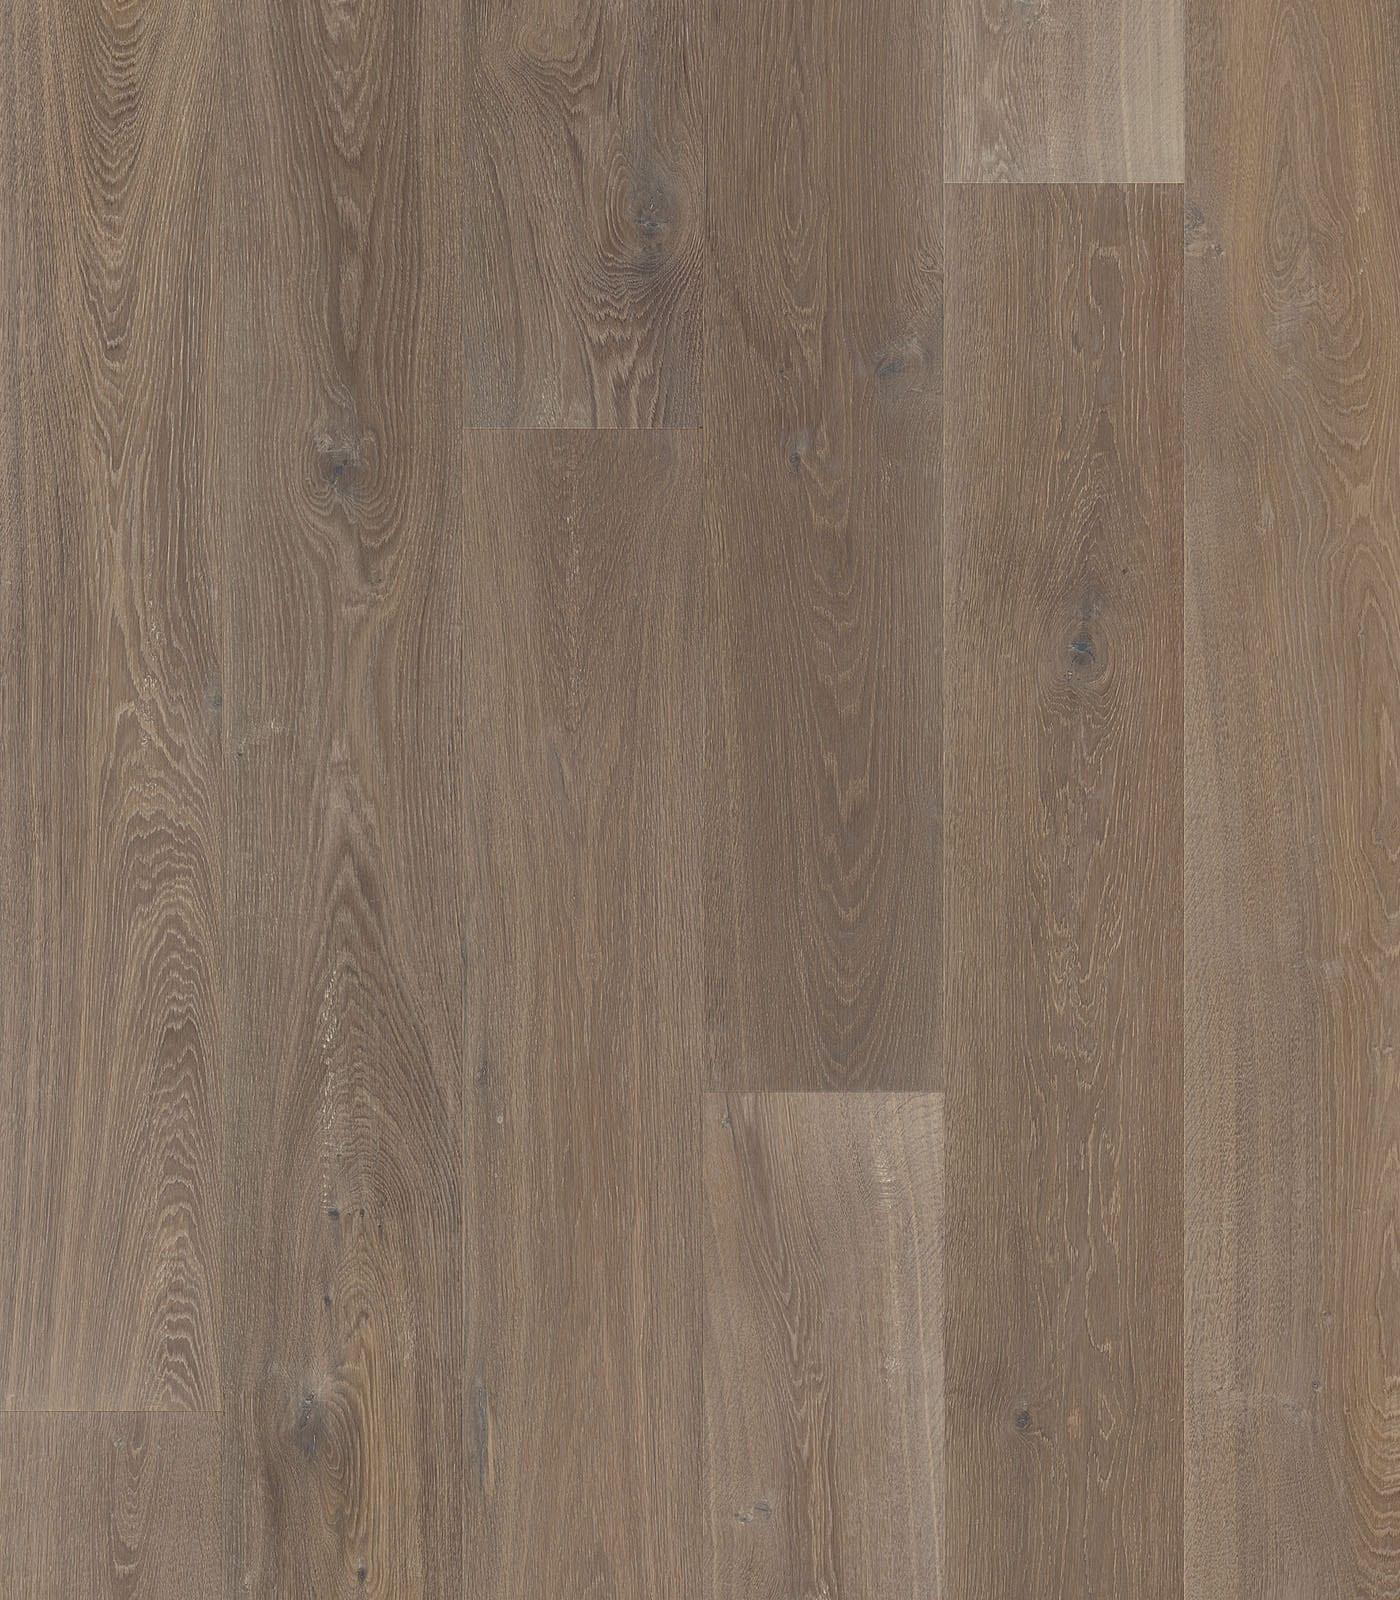 Formentera-European Oak Floors-Lifestyle Collection-flat